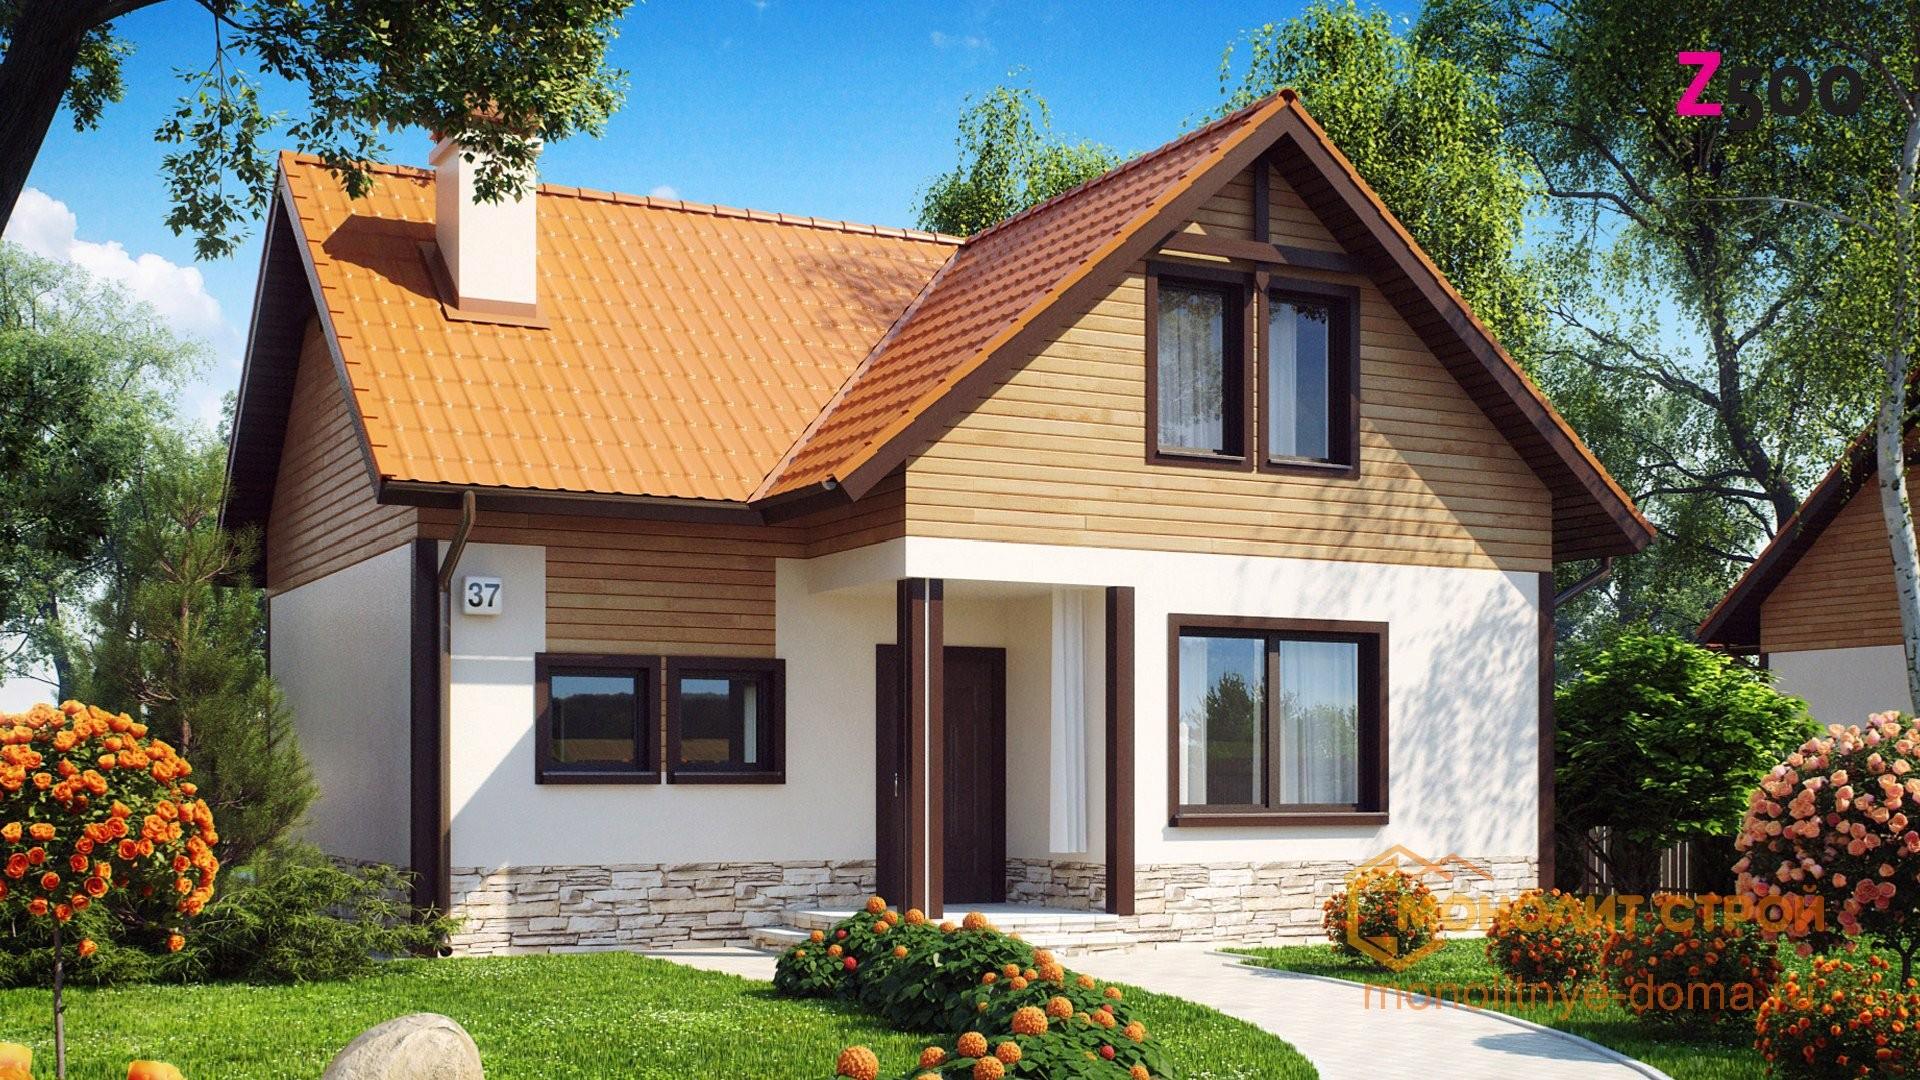 Монолитные дома керамзитобетона производители бетона самара